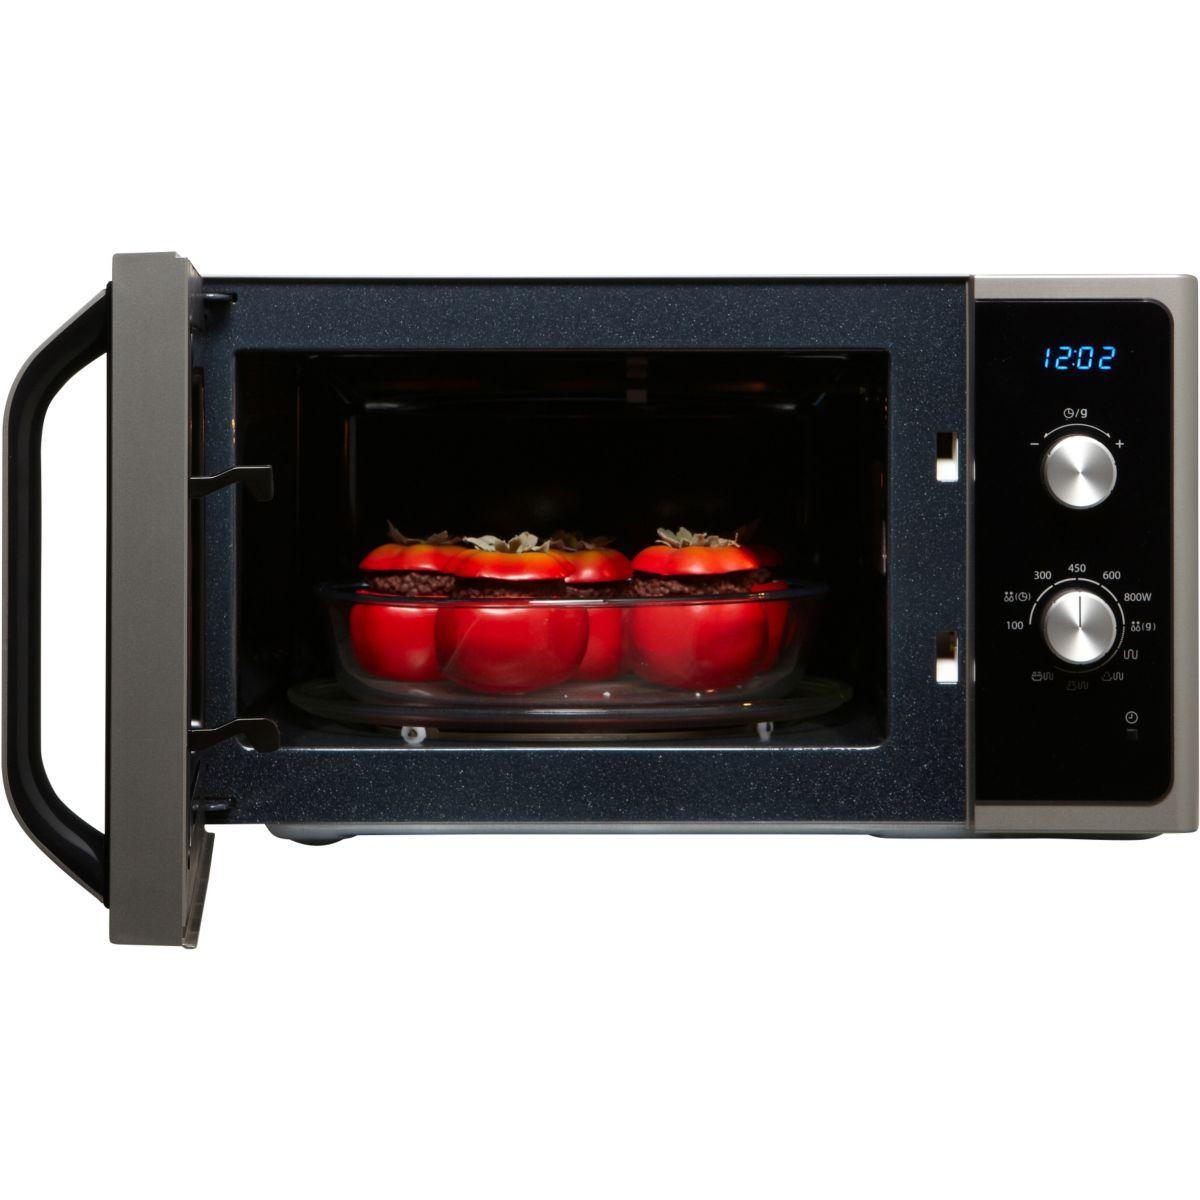 Micro-onde grill samsung mg23f301efs - 2% de remise : code gam2